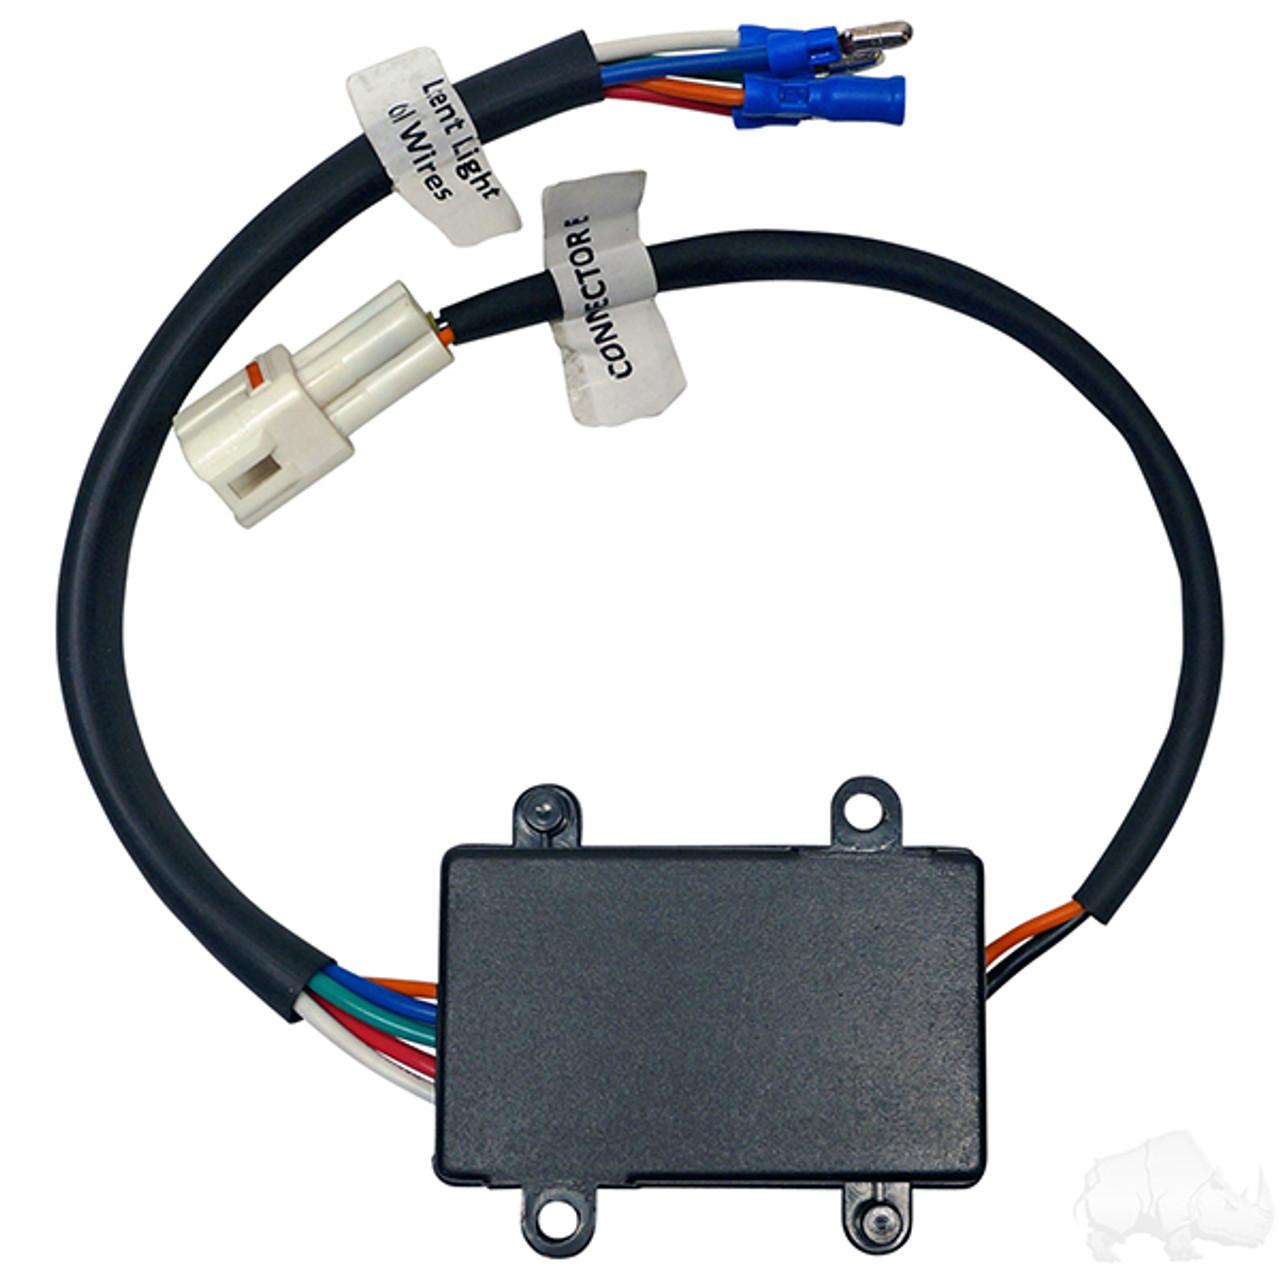 LGT-330 RGBW Controller